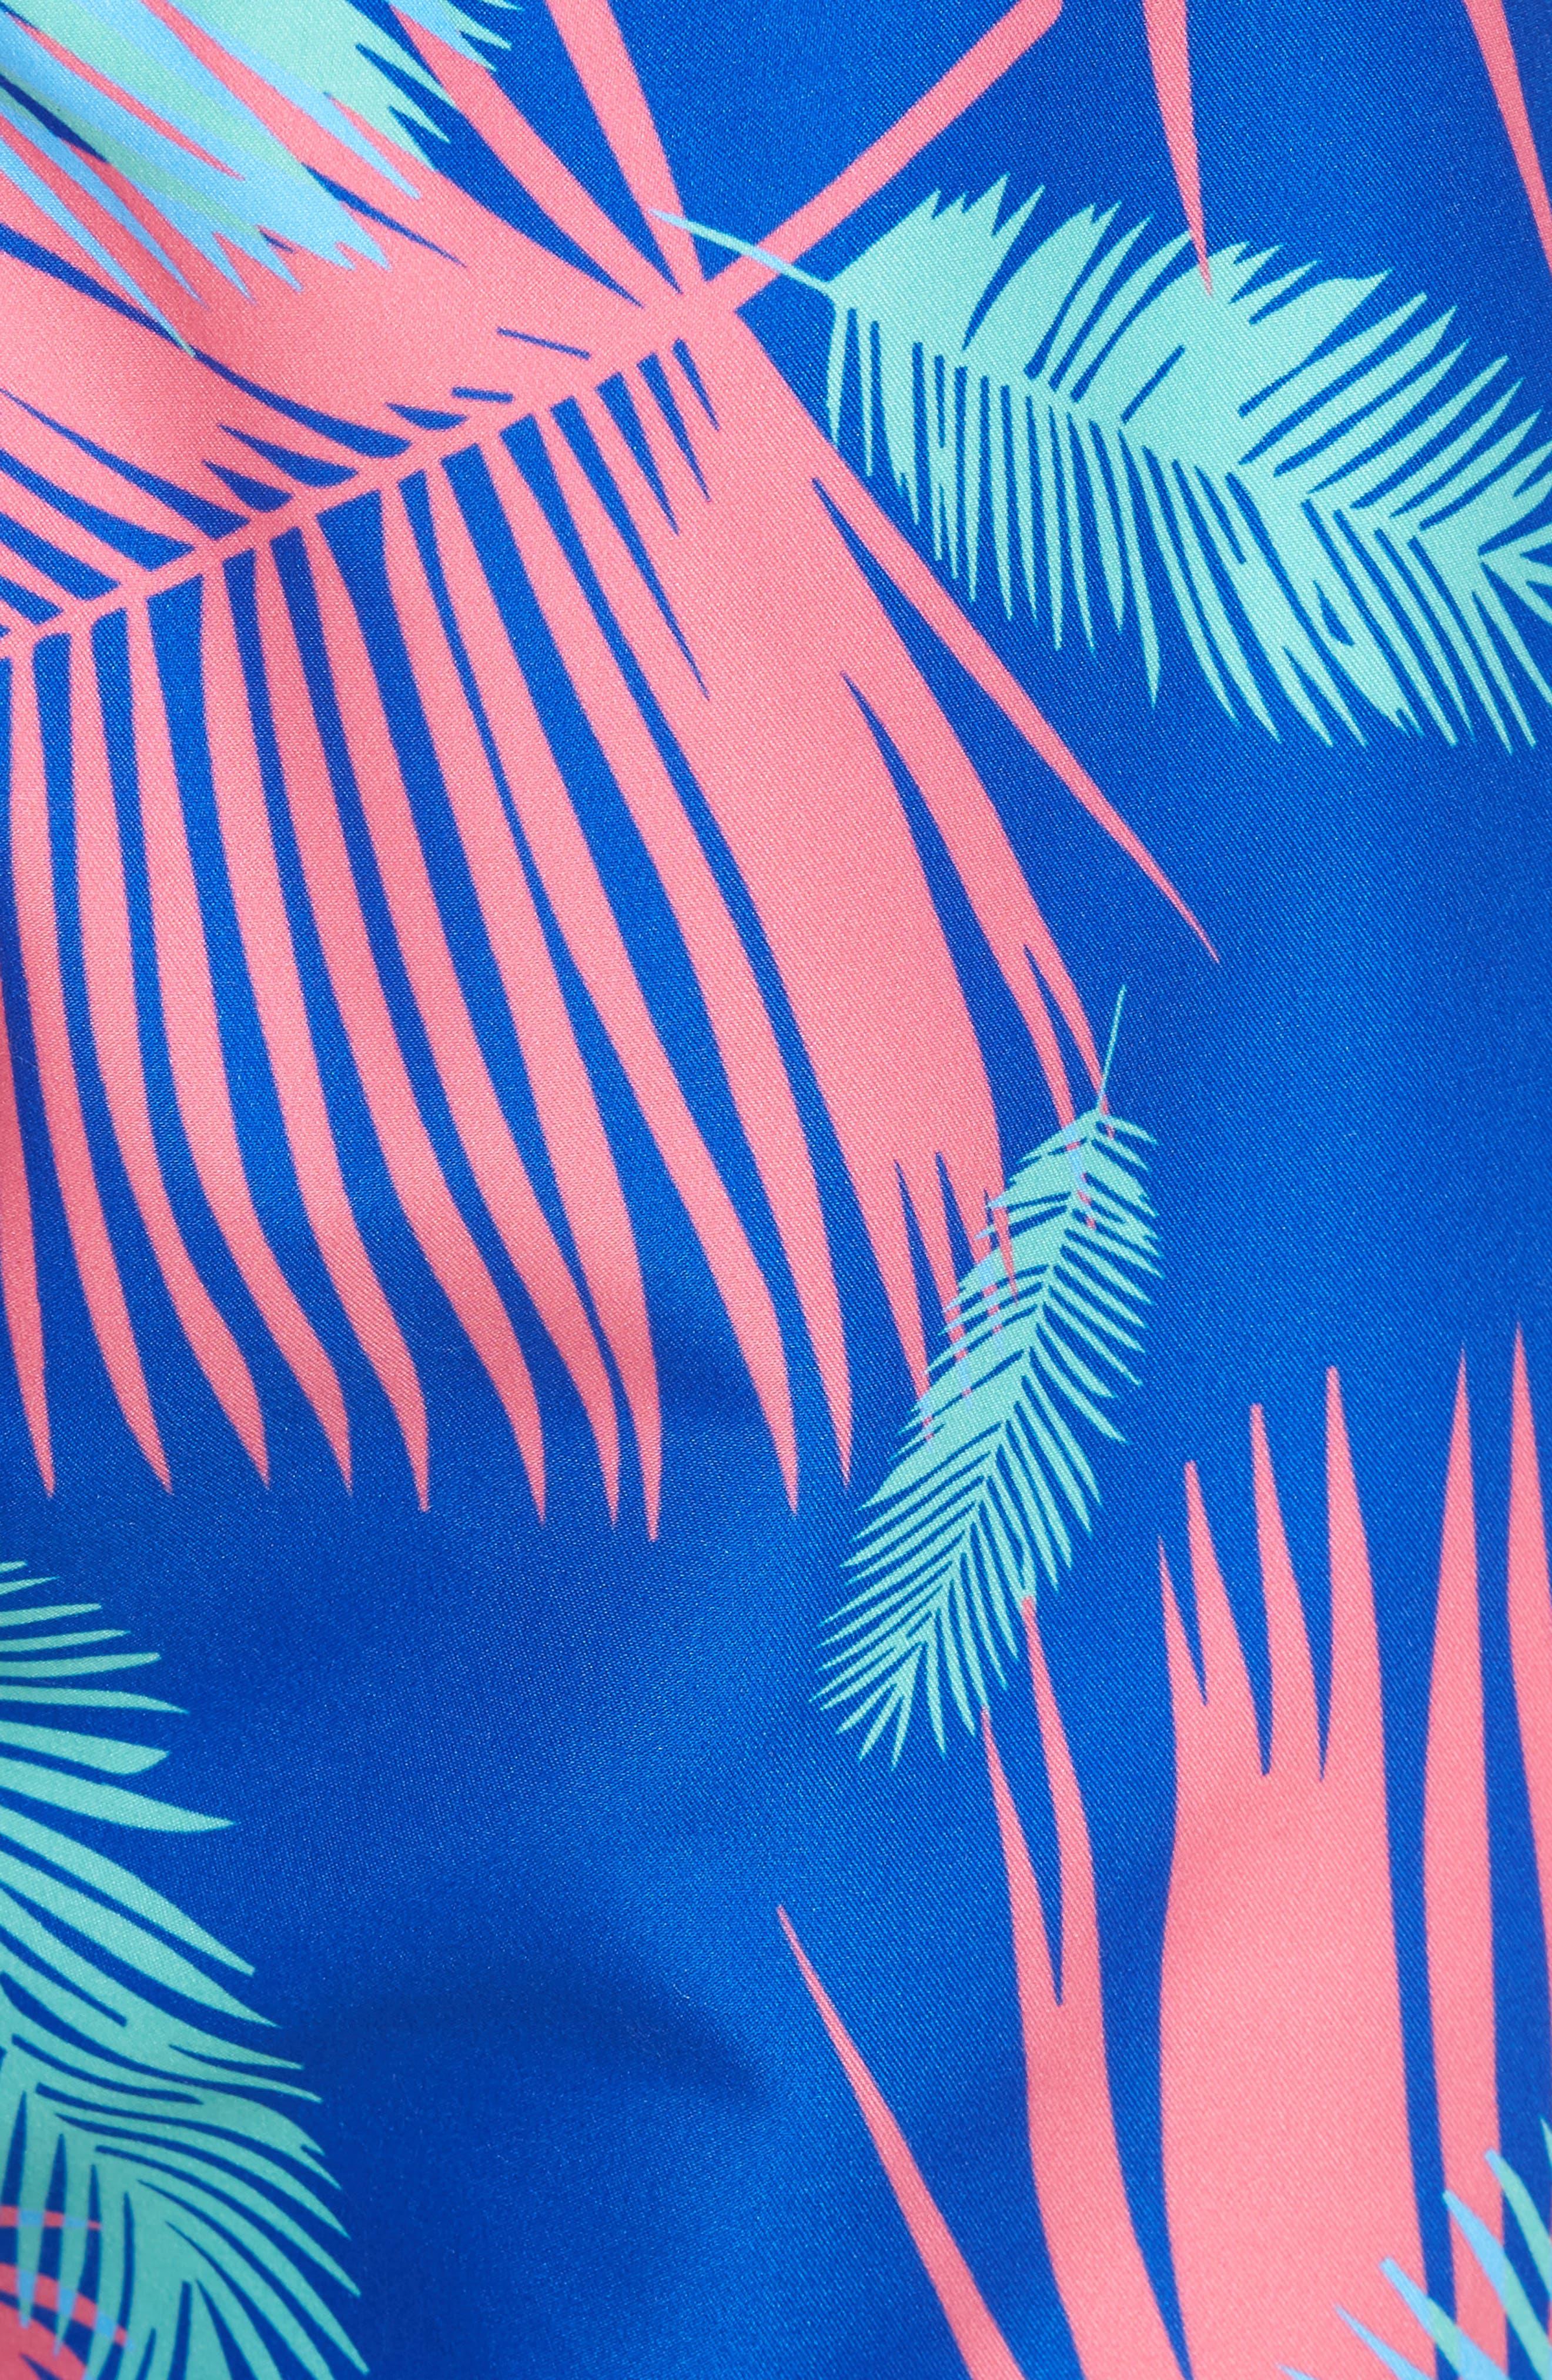 Tropicano Swim Trunks,                             Alternate thumbnail 5, color,                             400